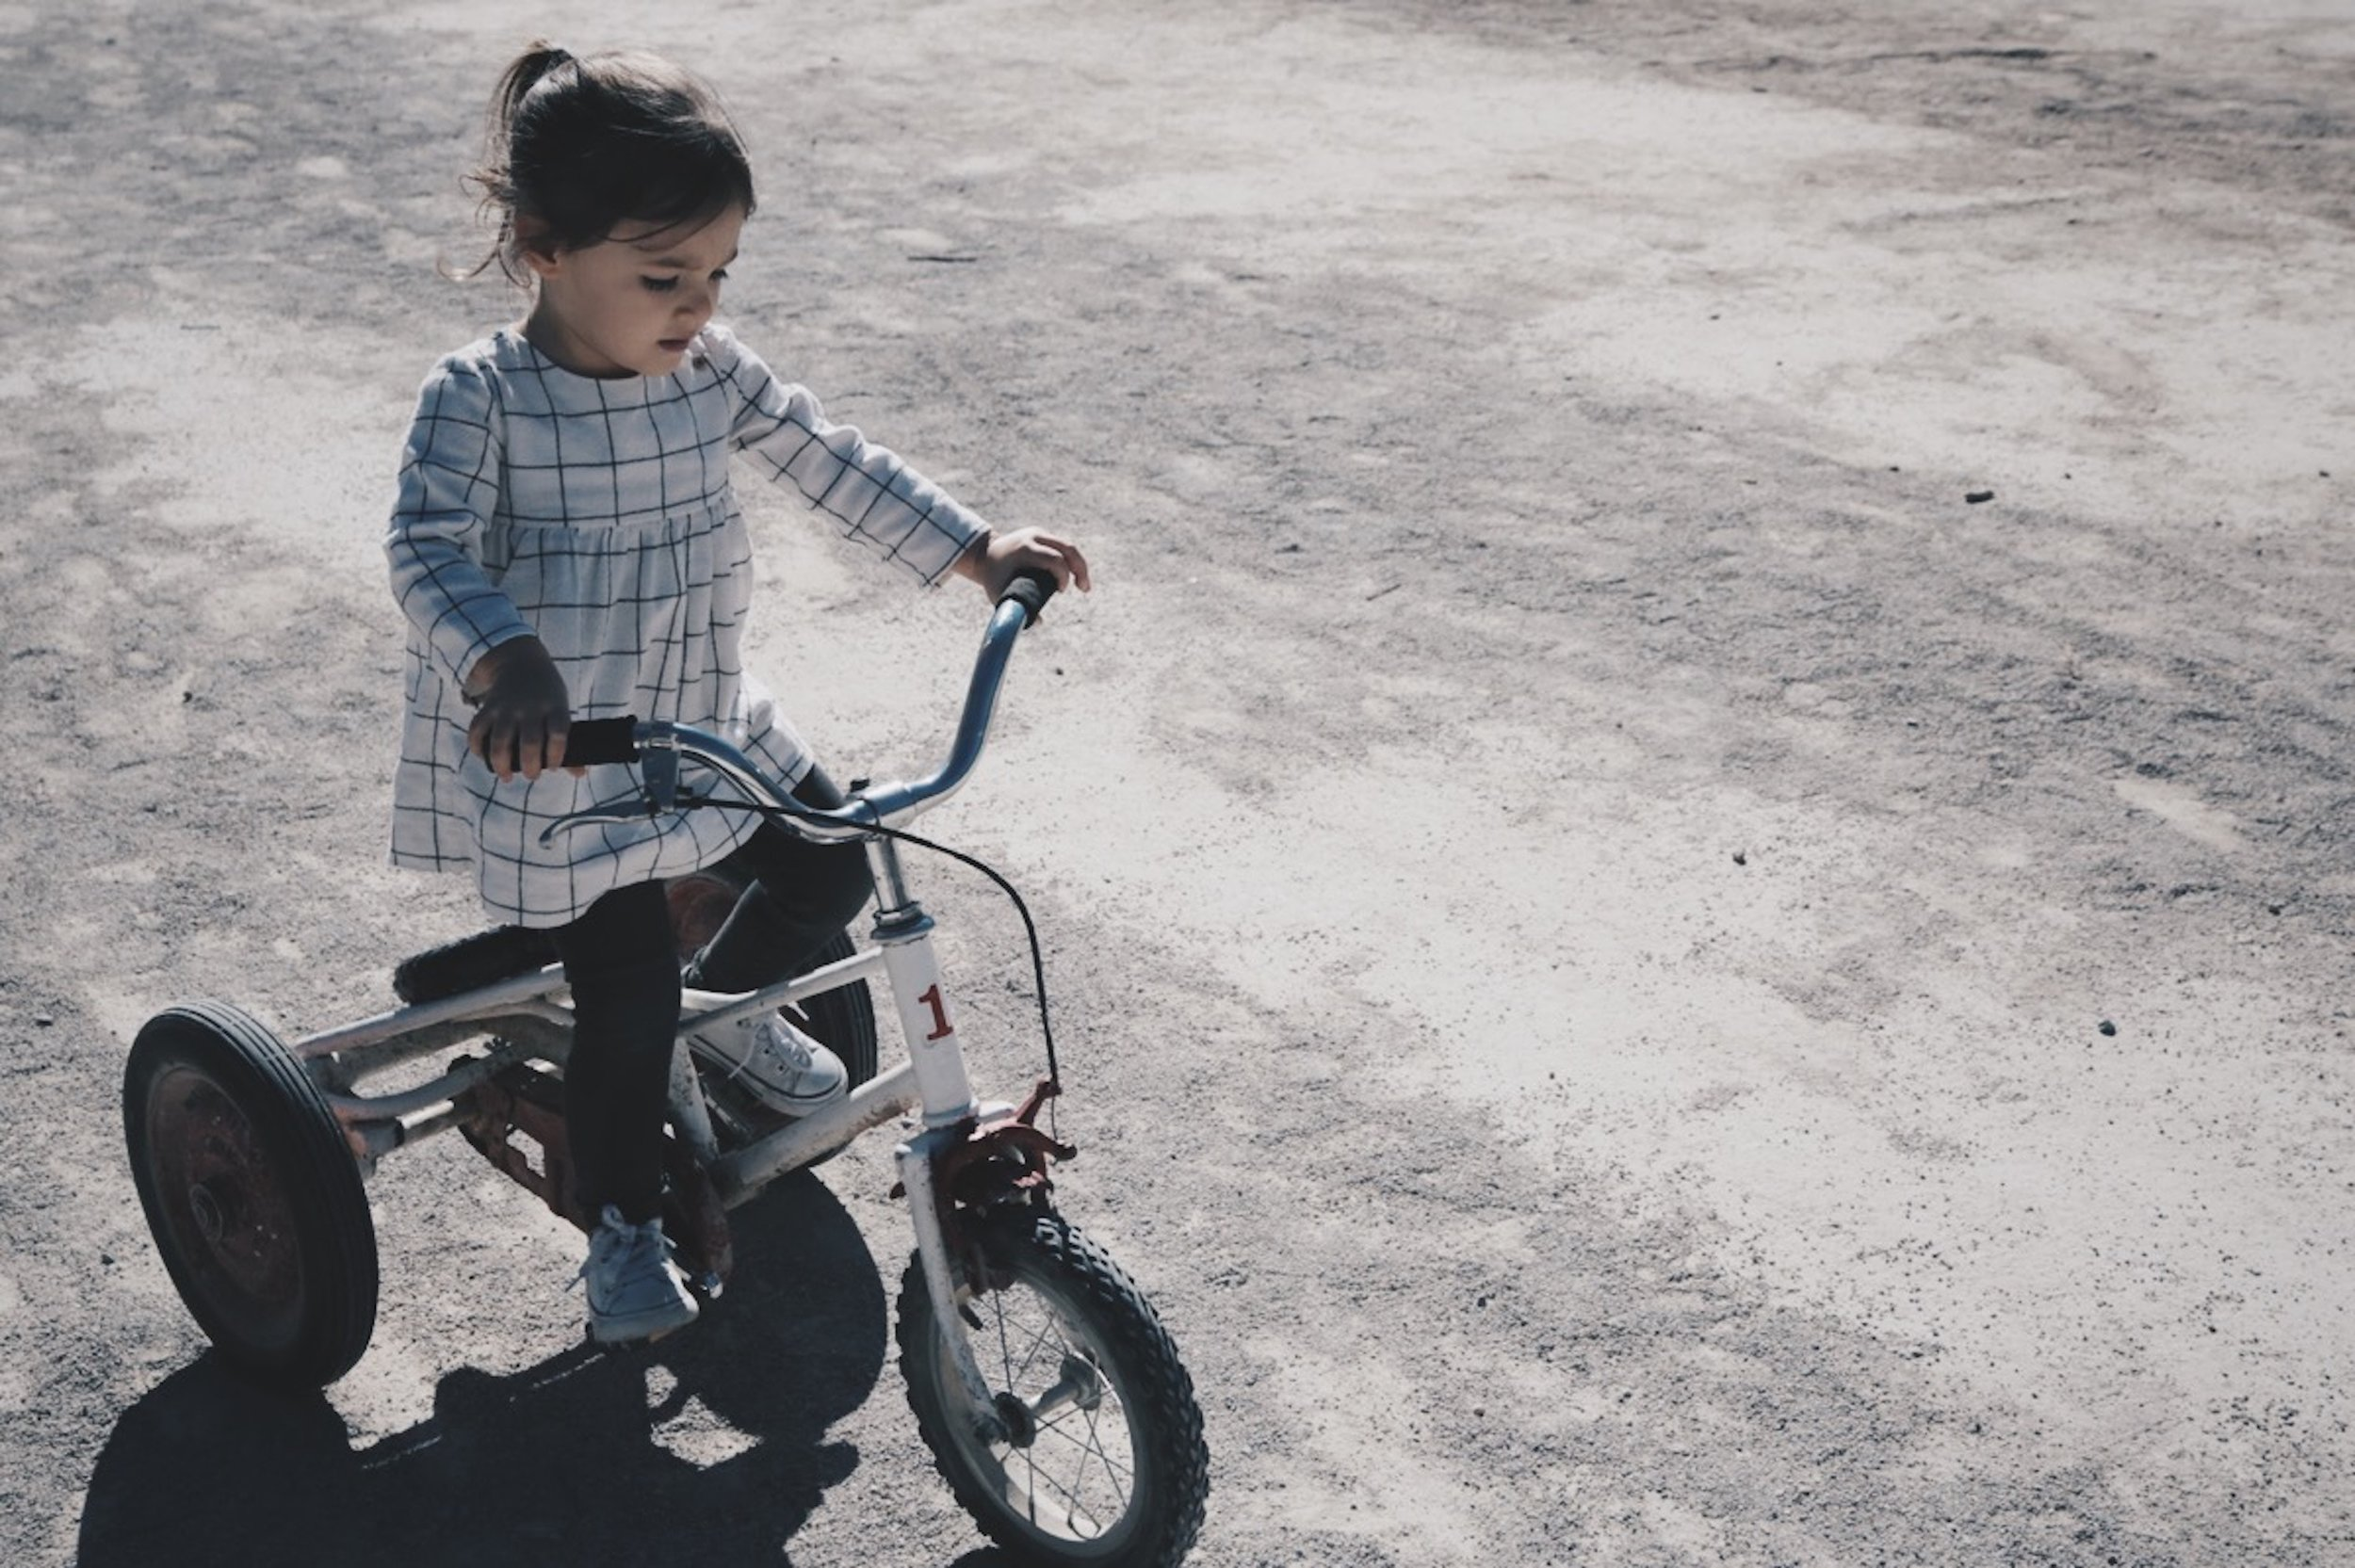 caroline-hernandez-219836-unsplash girl on bike gaining confidence .jpg